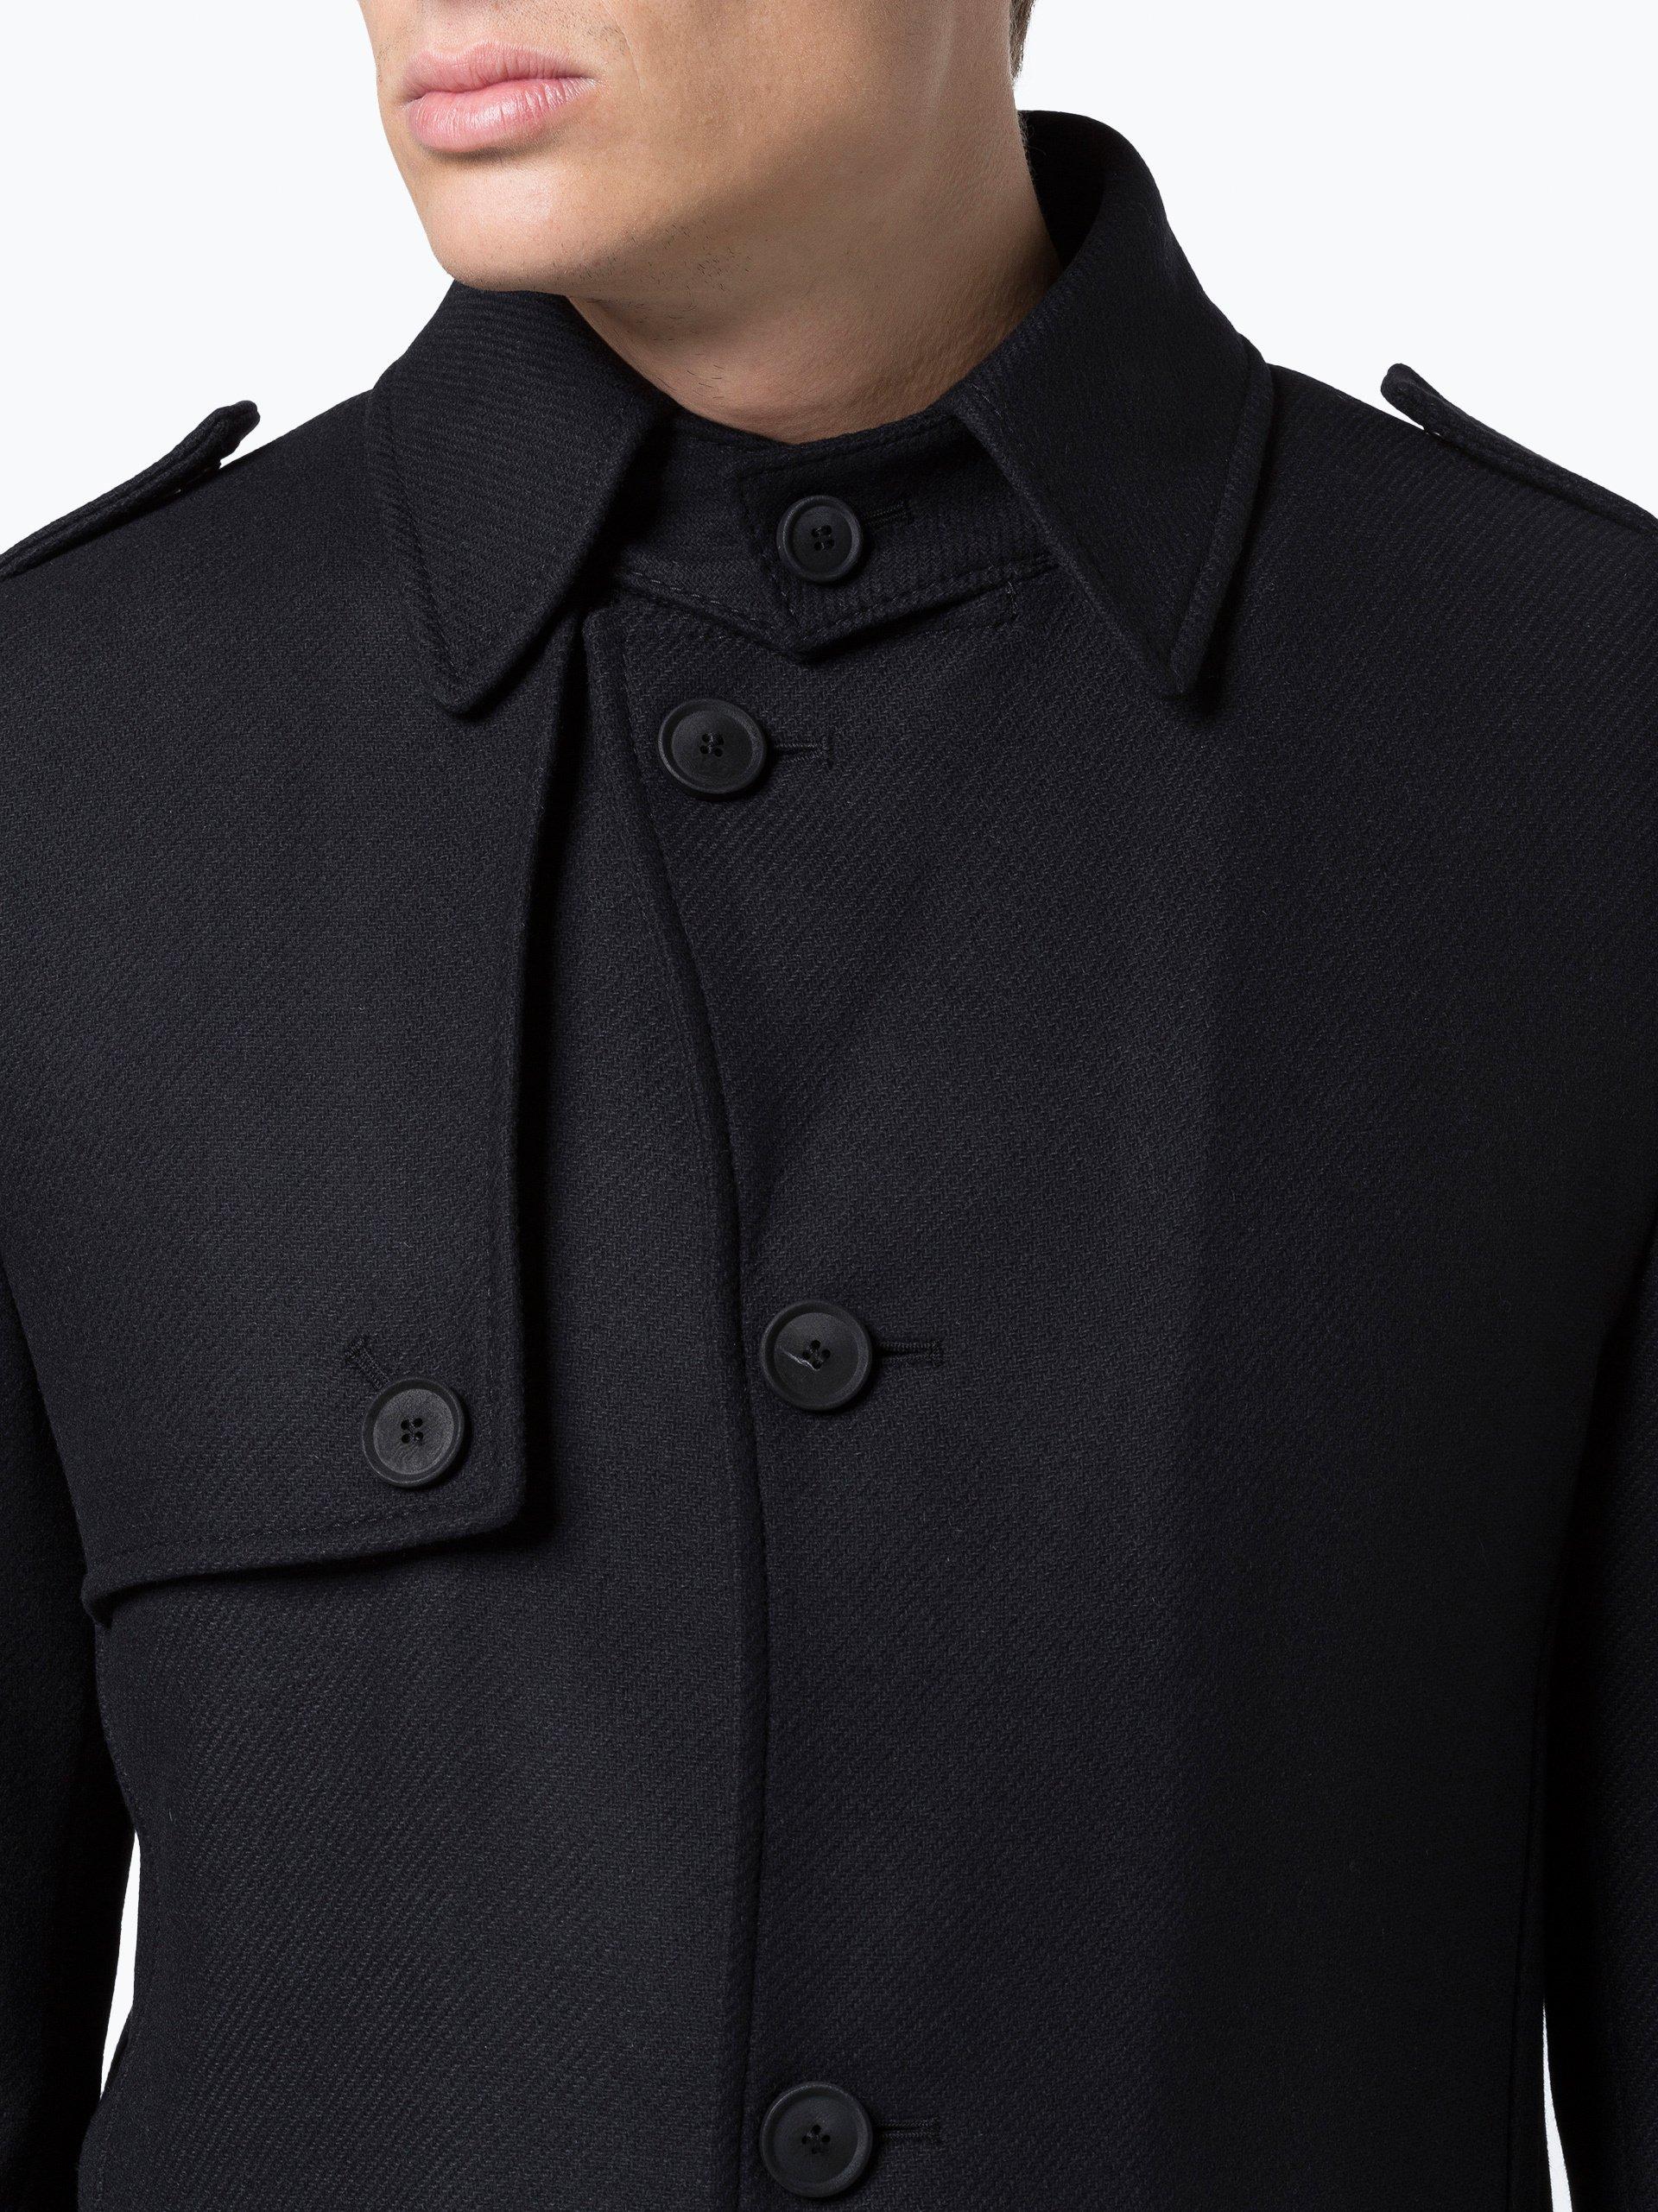 drykorn herren mantel skopje schwarz uni online kaufen. Black Bedroom Furniture Sets. Home Design Ideas